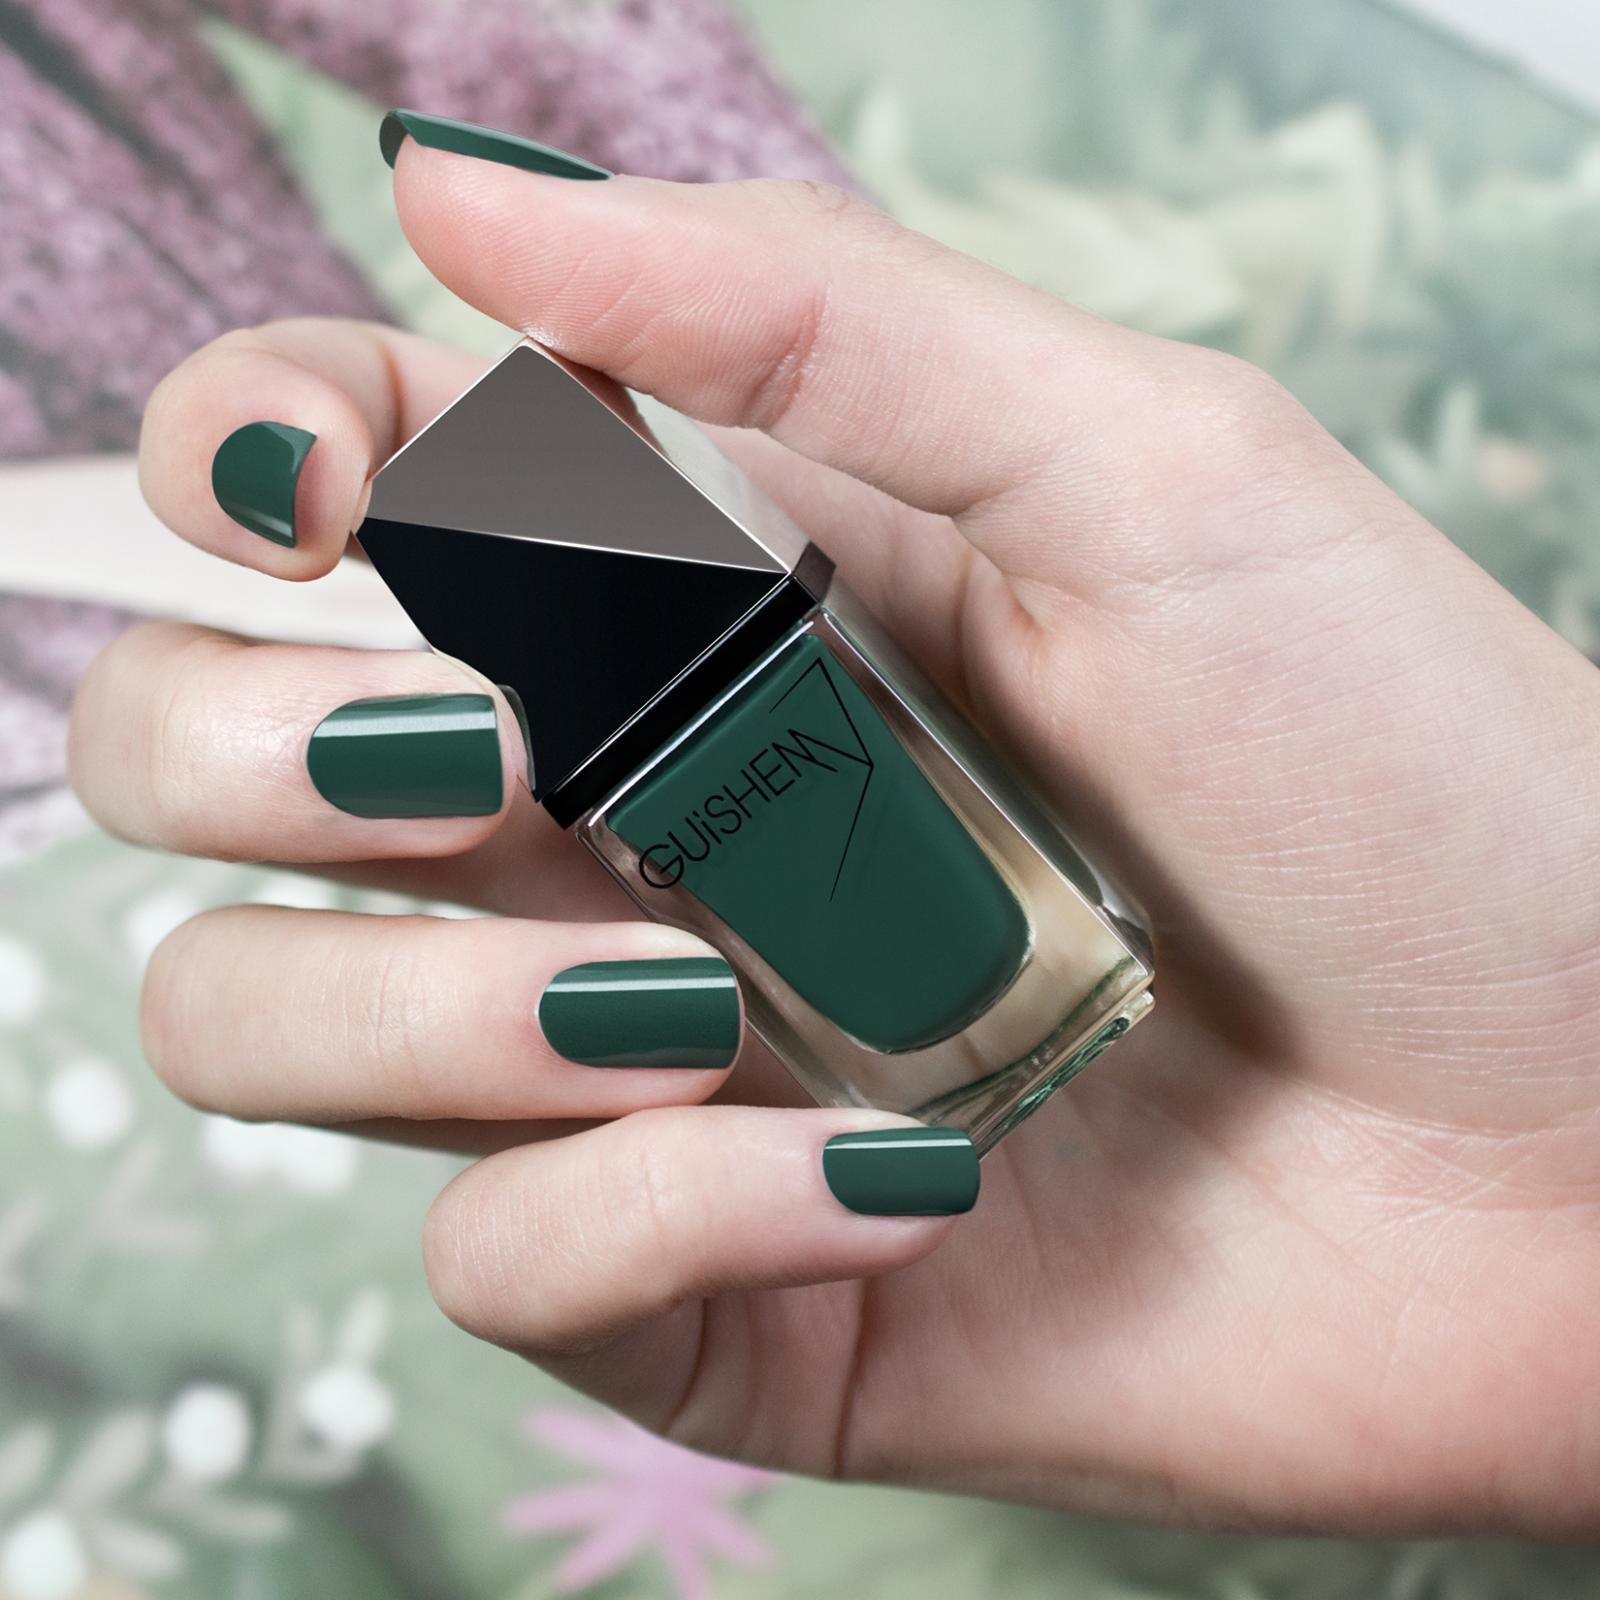 GUiSHEM Premium Nail Lacquer Crème Teal Green, Lagoon - 150